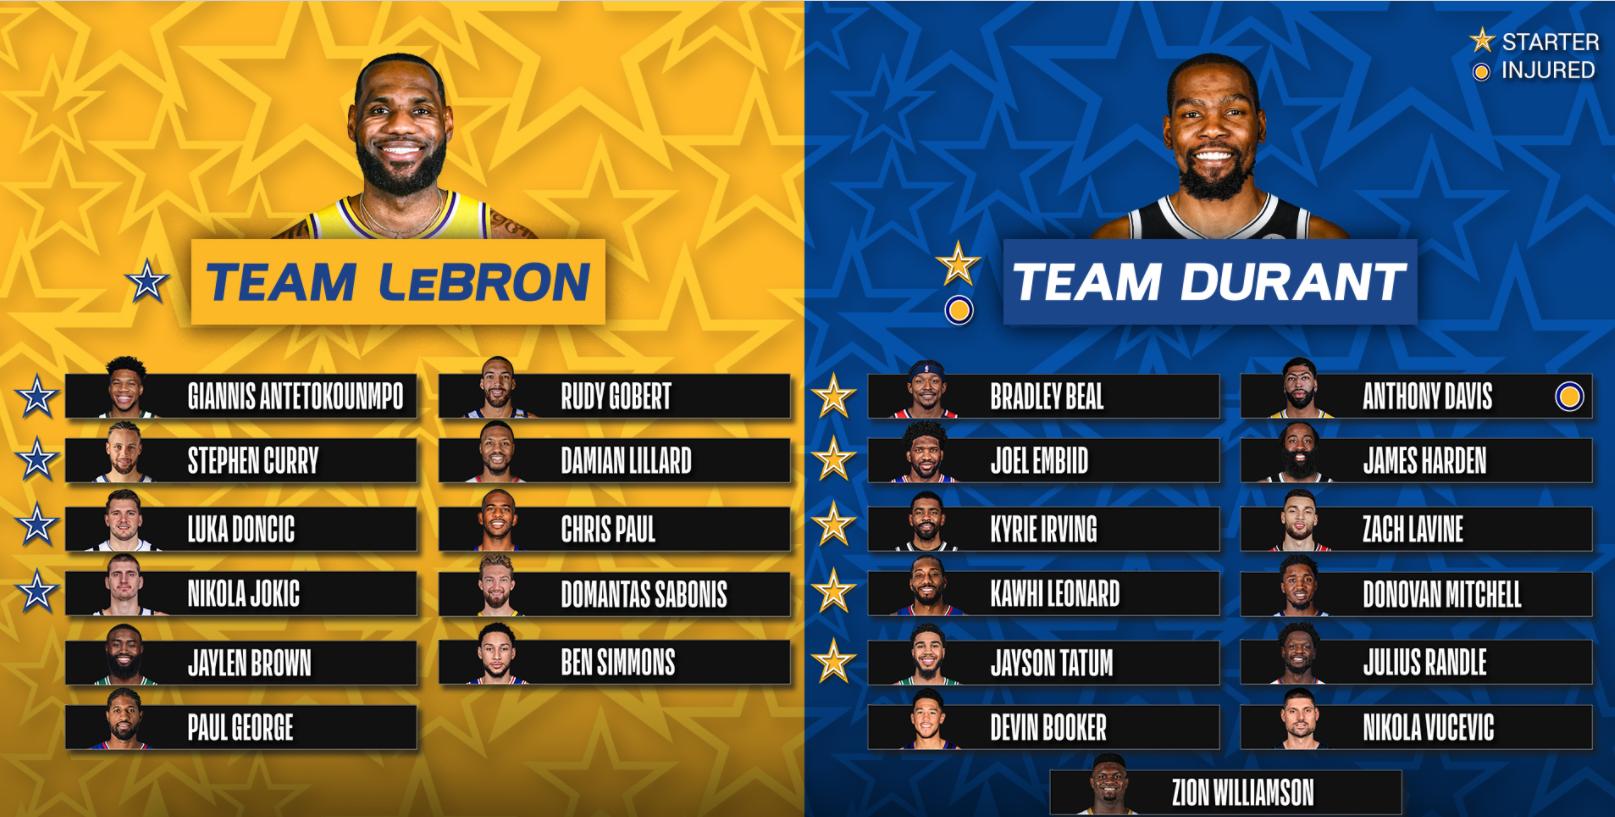 NBA All-Star Game 2021: i roster di Team LeBron e Team Durant